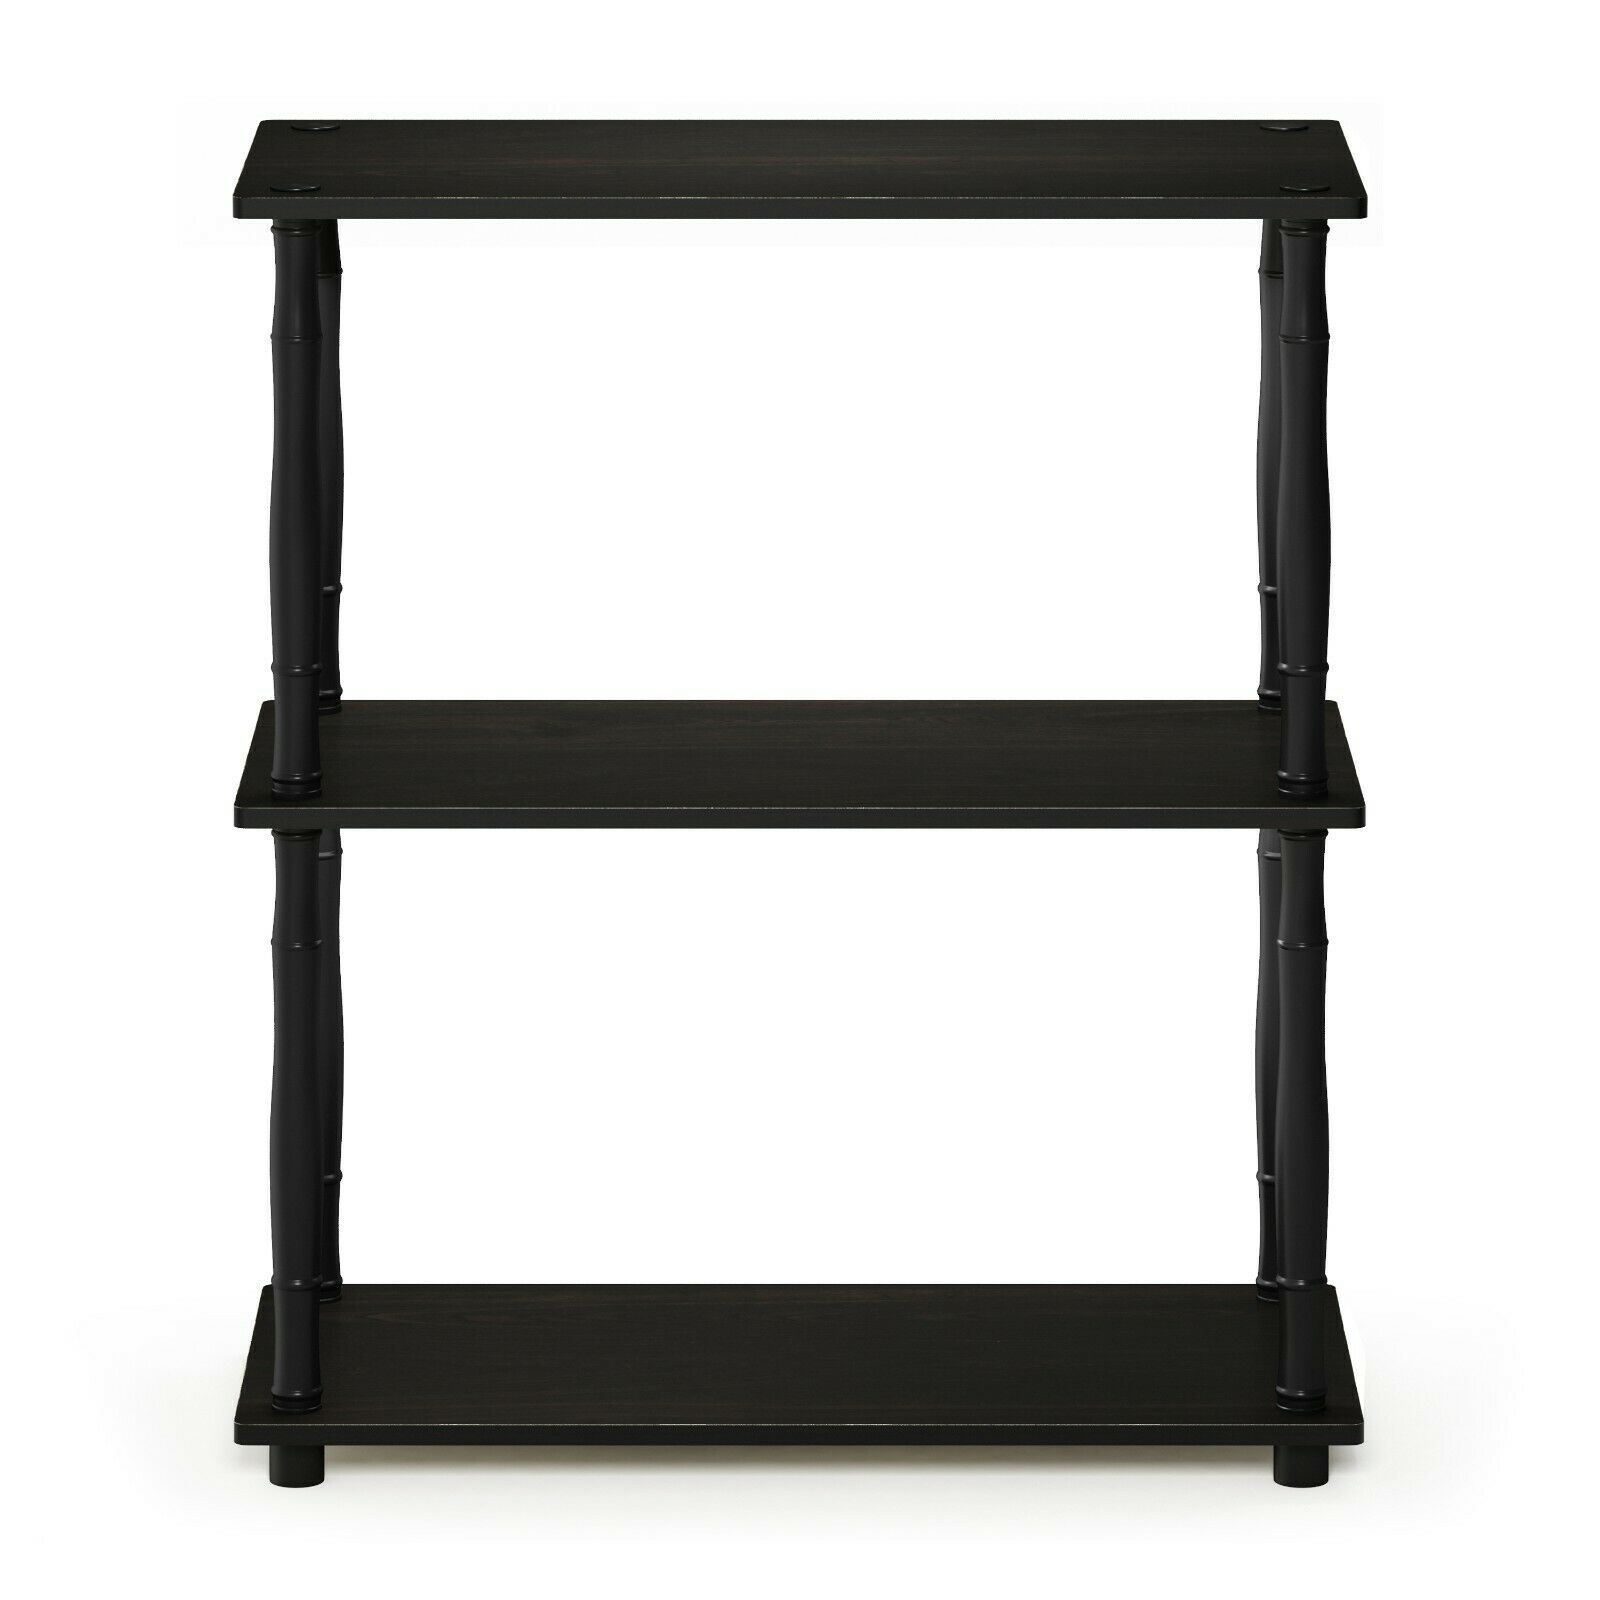 Furinno Turn-N-Tube 3-Tier Compact Multipurpose Shelf Display Rack with Classic Tube - Espresso/Black